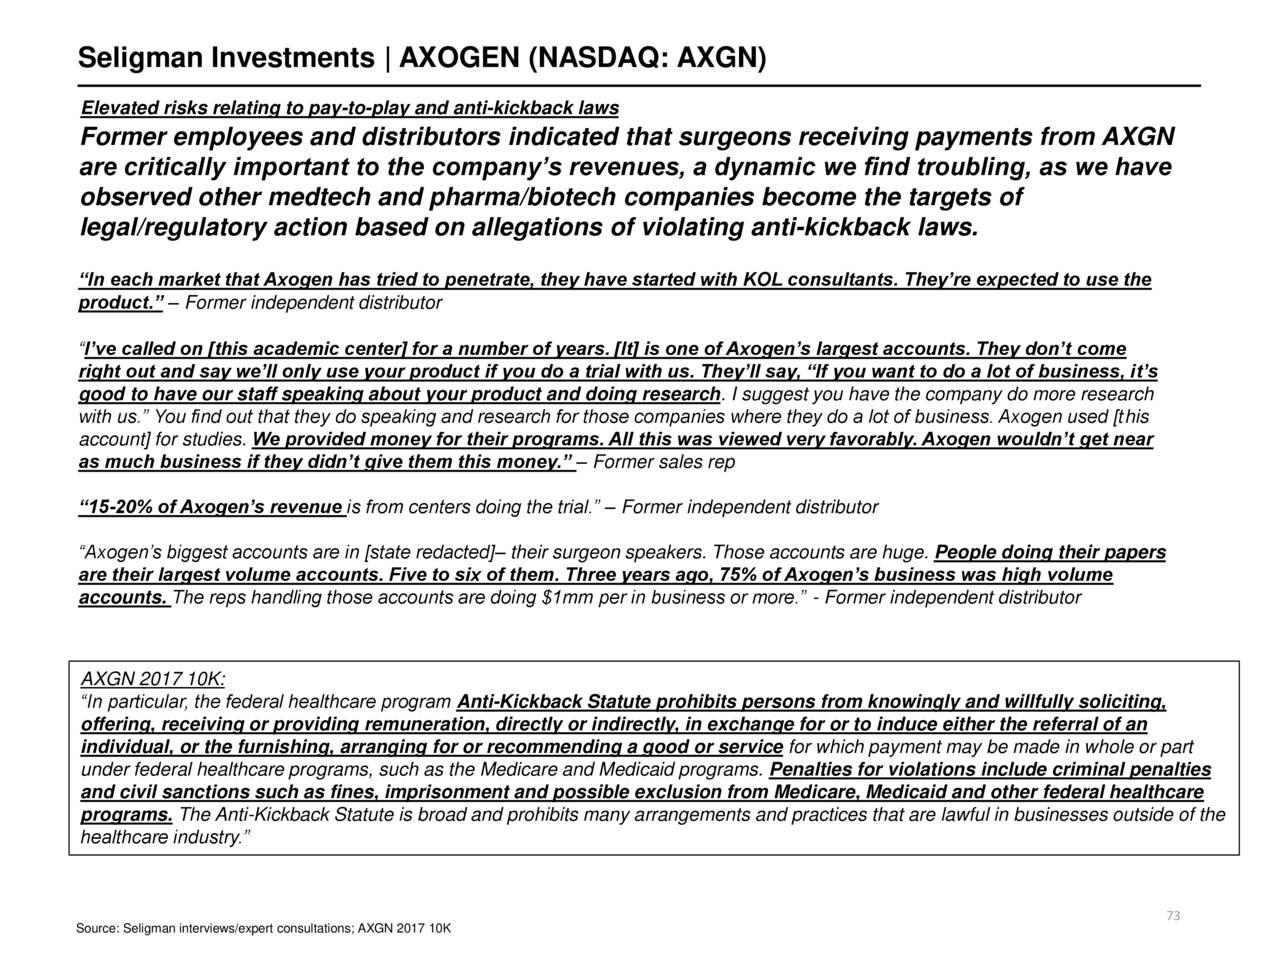 AxoGen: An Overhyped, Cash-Burning Reverse Merger At 12x